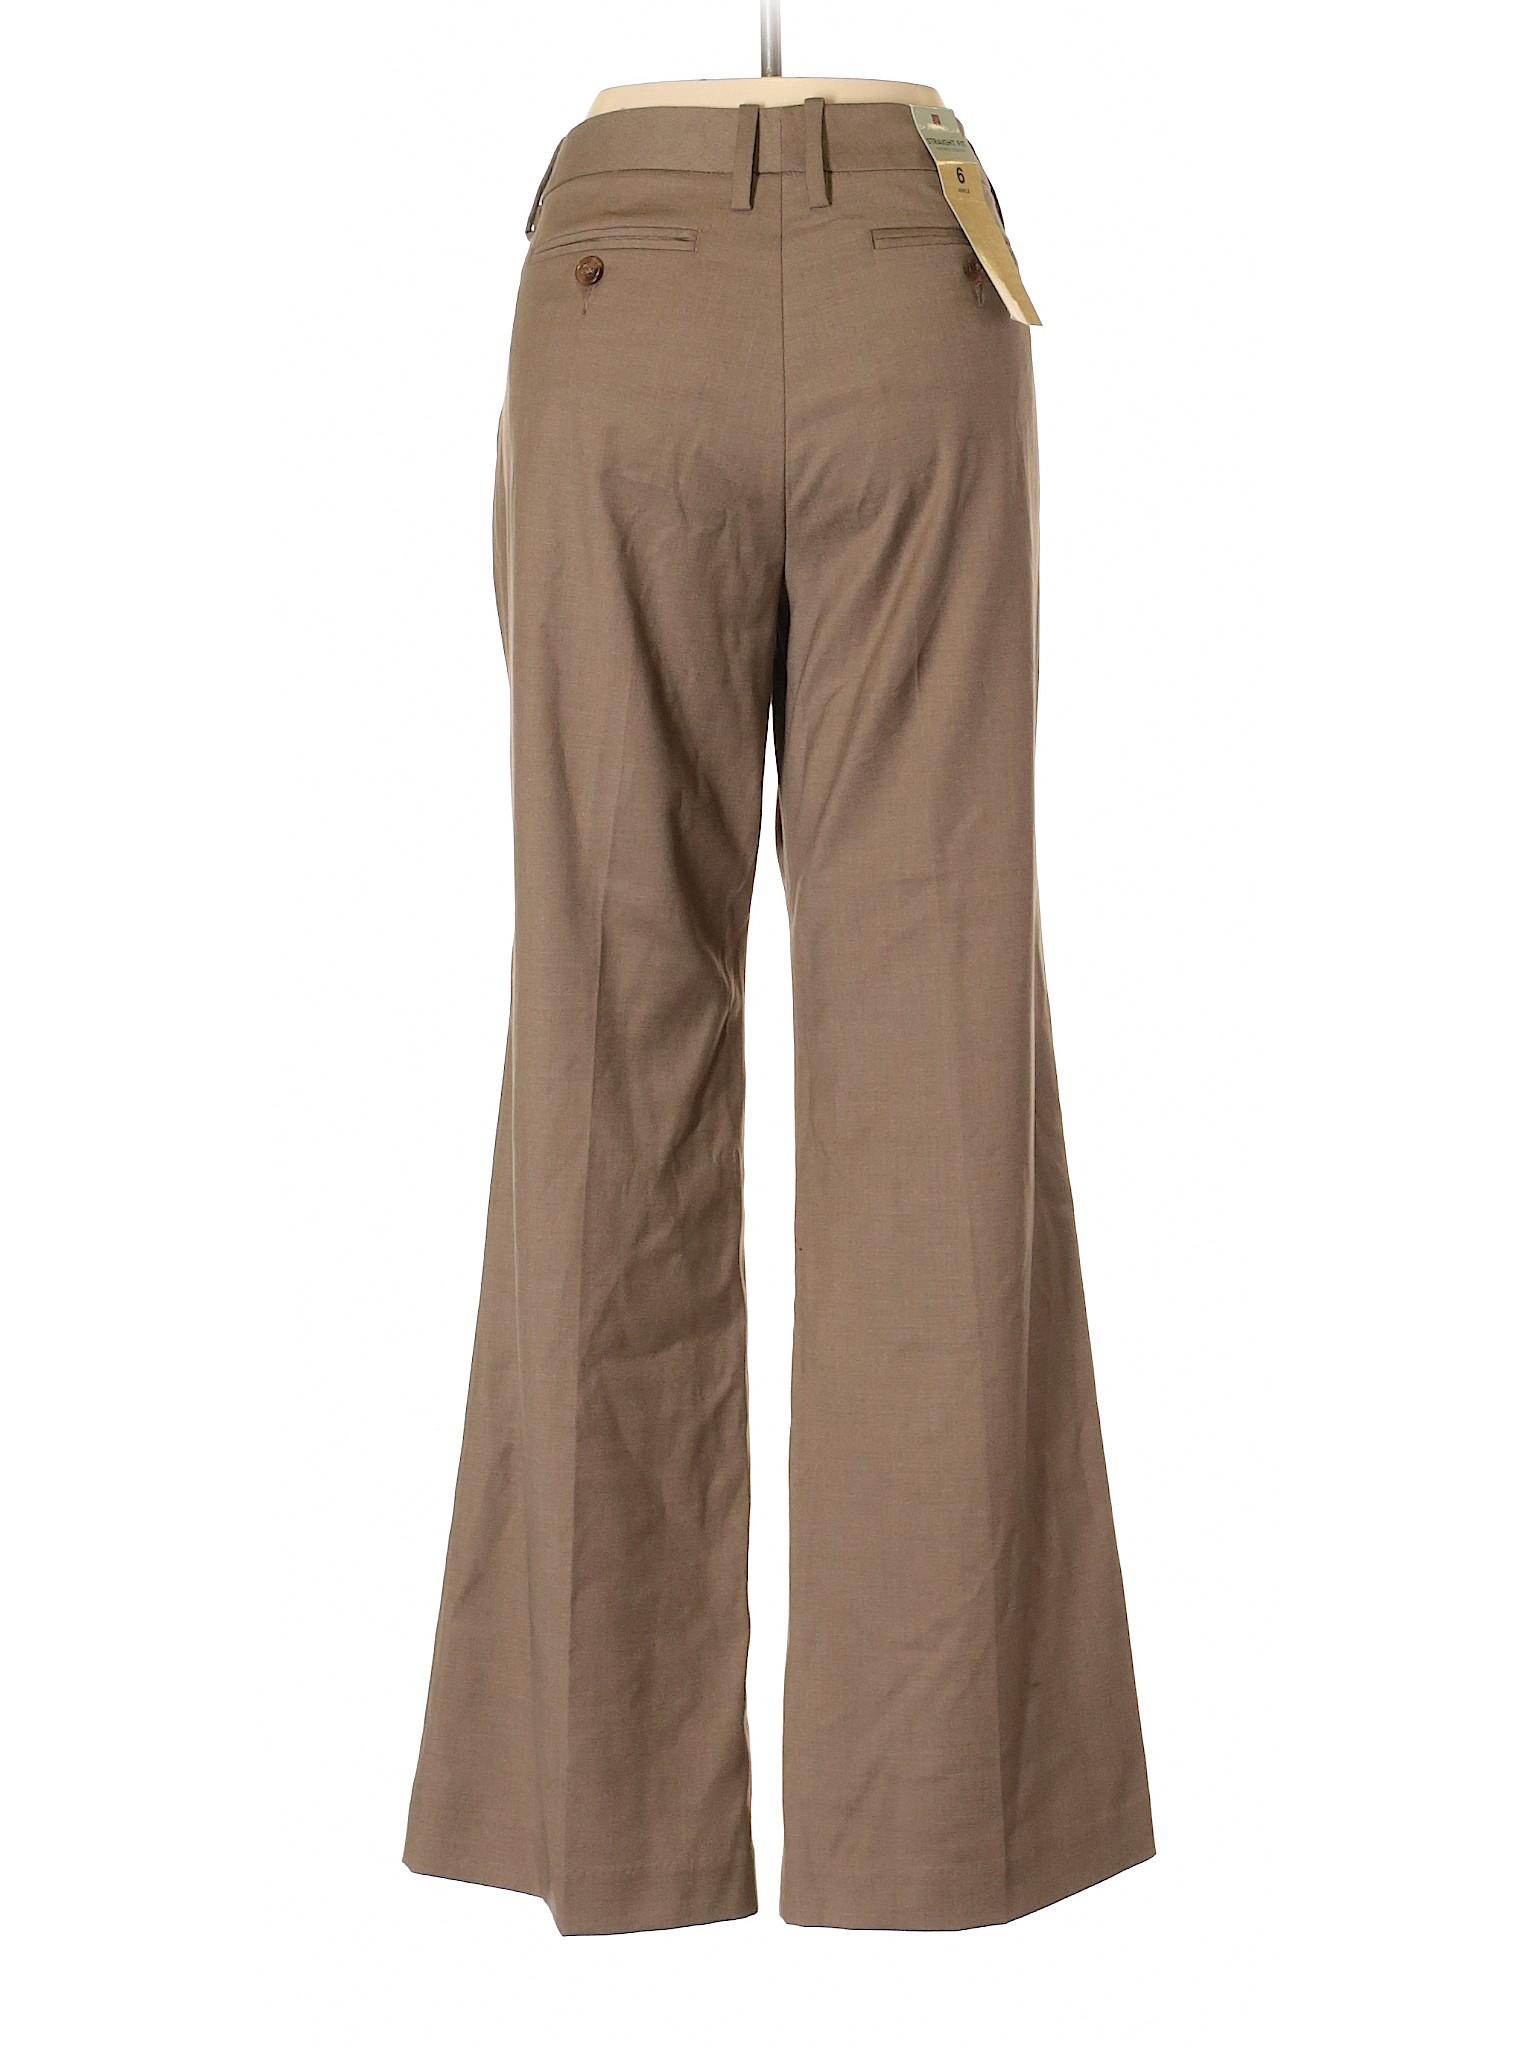 Gap Outlet Dress winter Pants Leisure aq8Zxwn